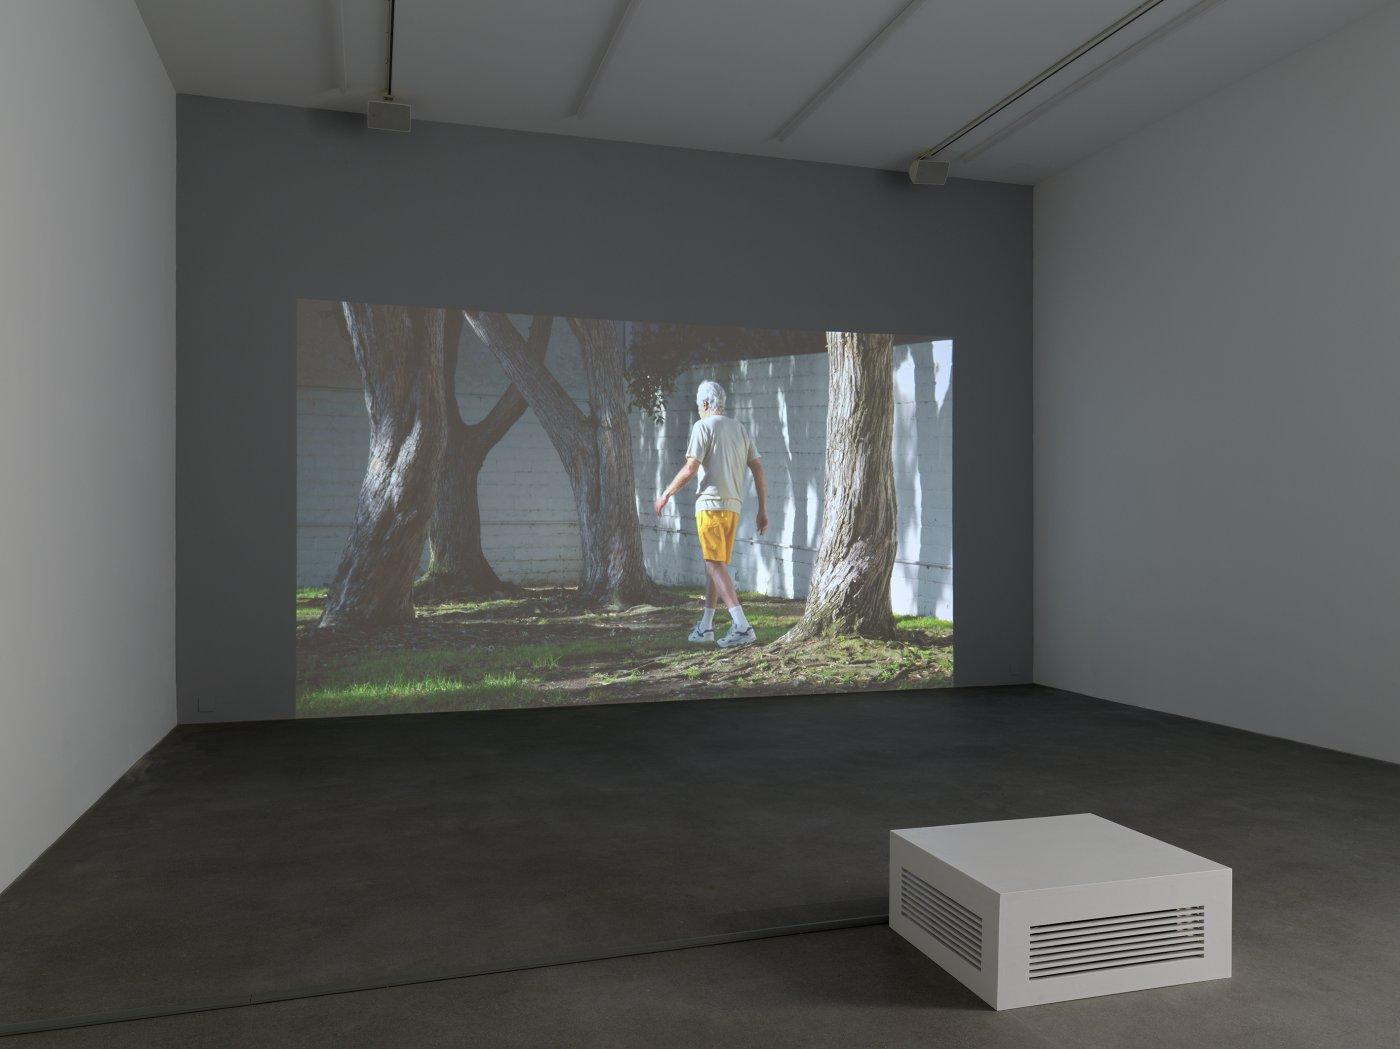 Galerie Eva Presenhuber Waldmanstrasse Torbjorn Rodland 6